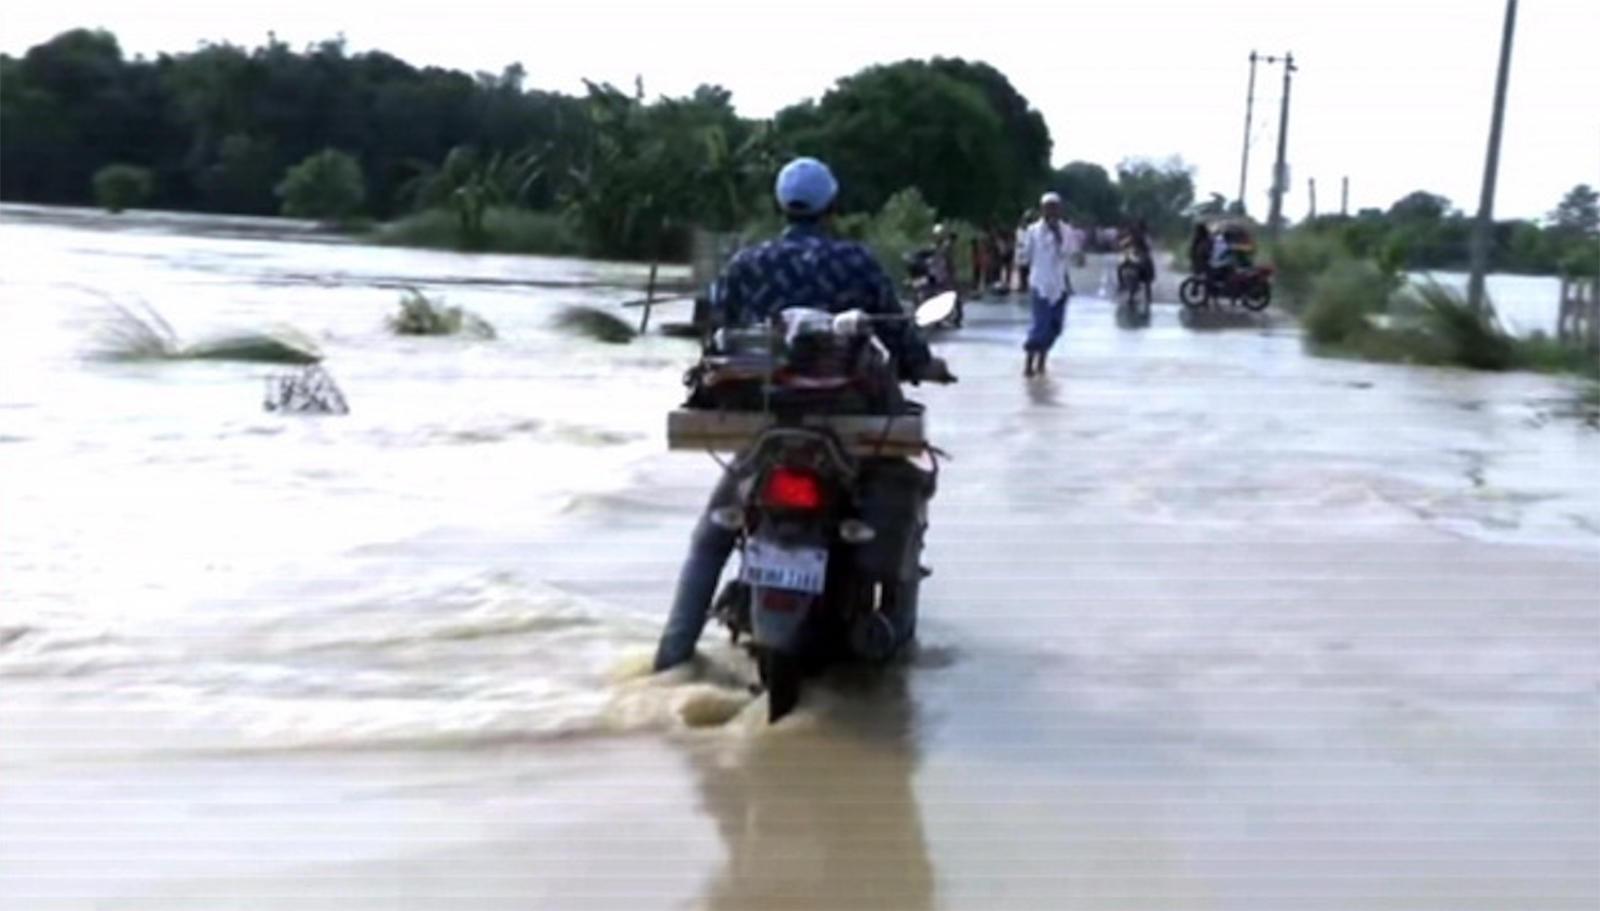 bihar-locals-abandon-submerged-village-as-flood-situation-worsens-in-darbhanga